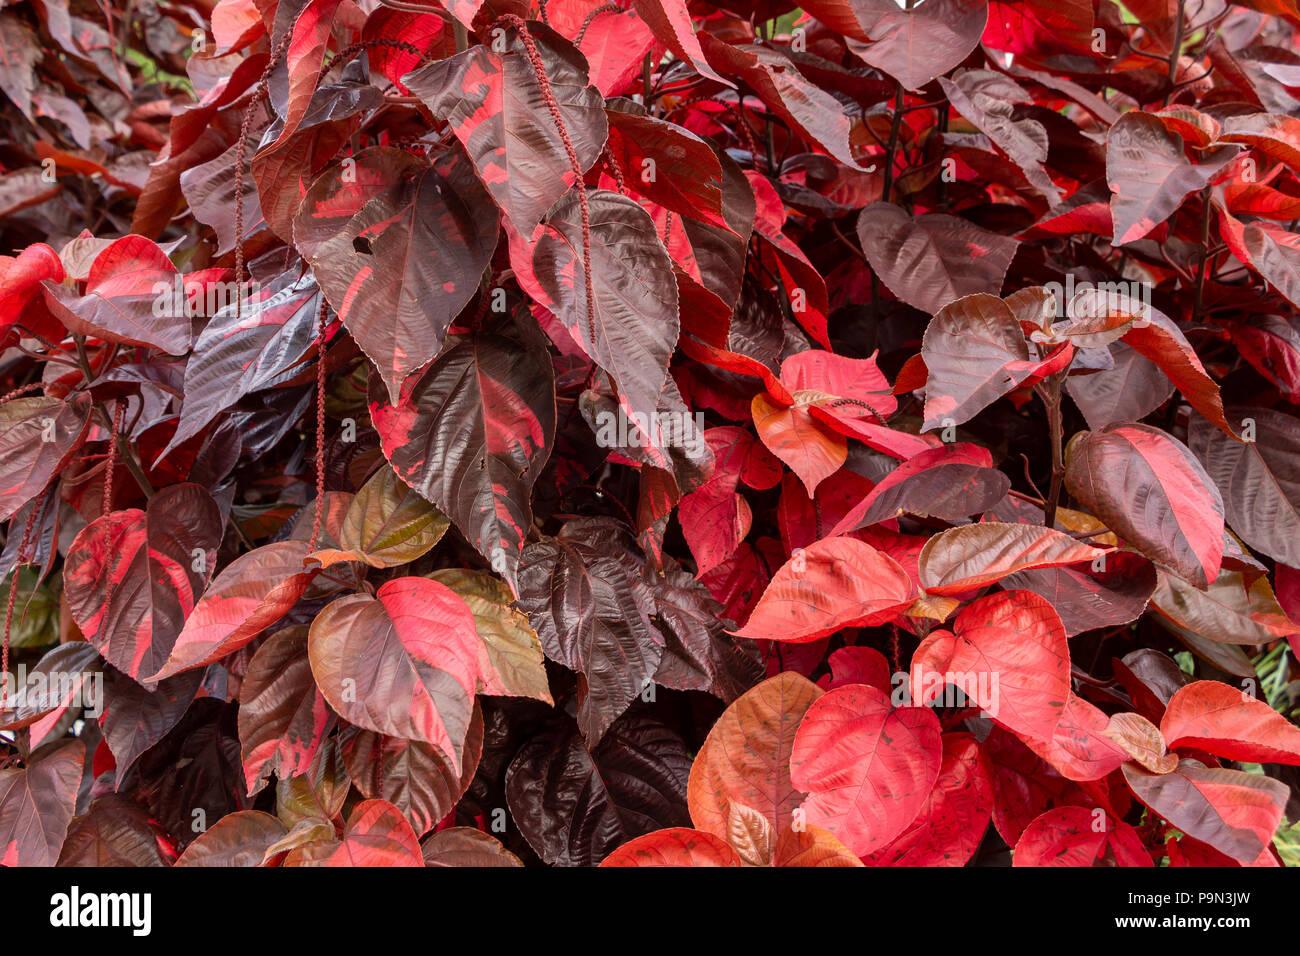 Copperleaf Plant Acalypha Amentacea Wilkesiana Red Leaves